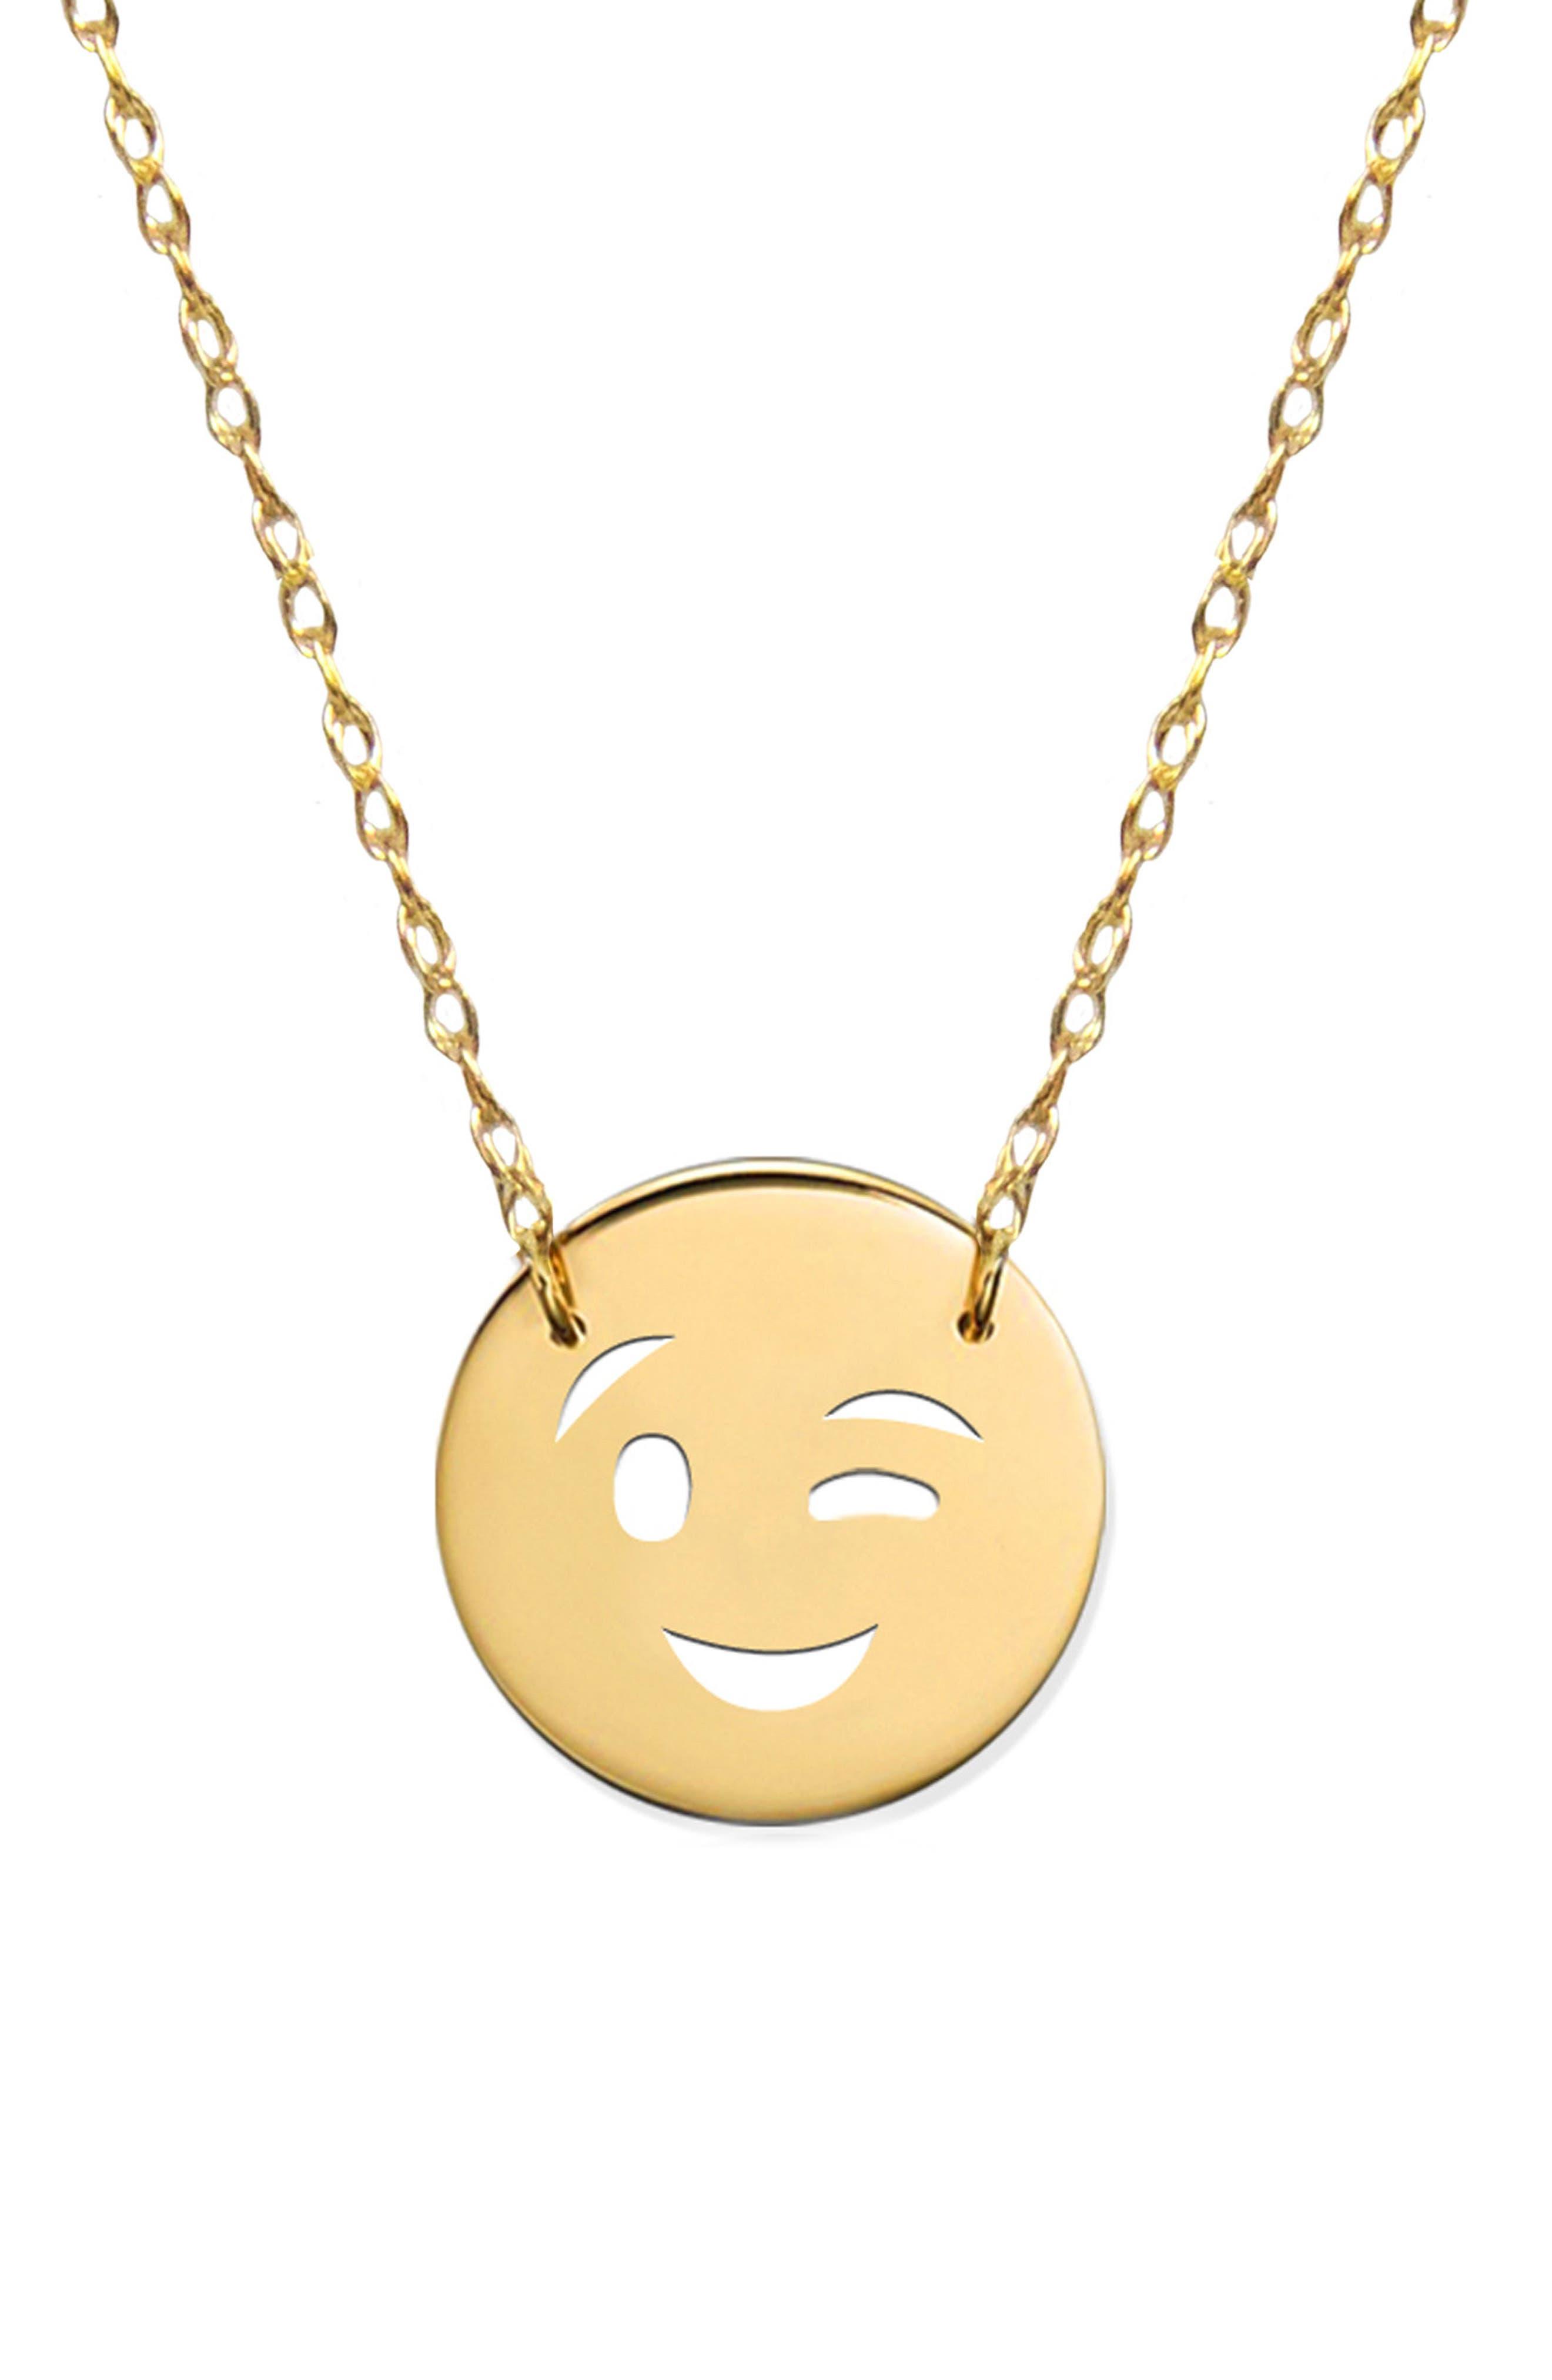 Wink Emoji Pendant Necklace,                             Main thumbnail 1, color,                             710